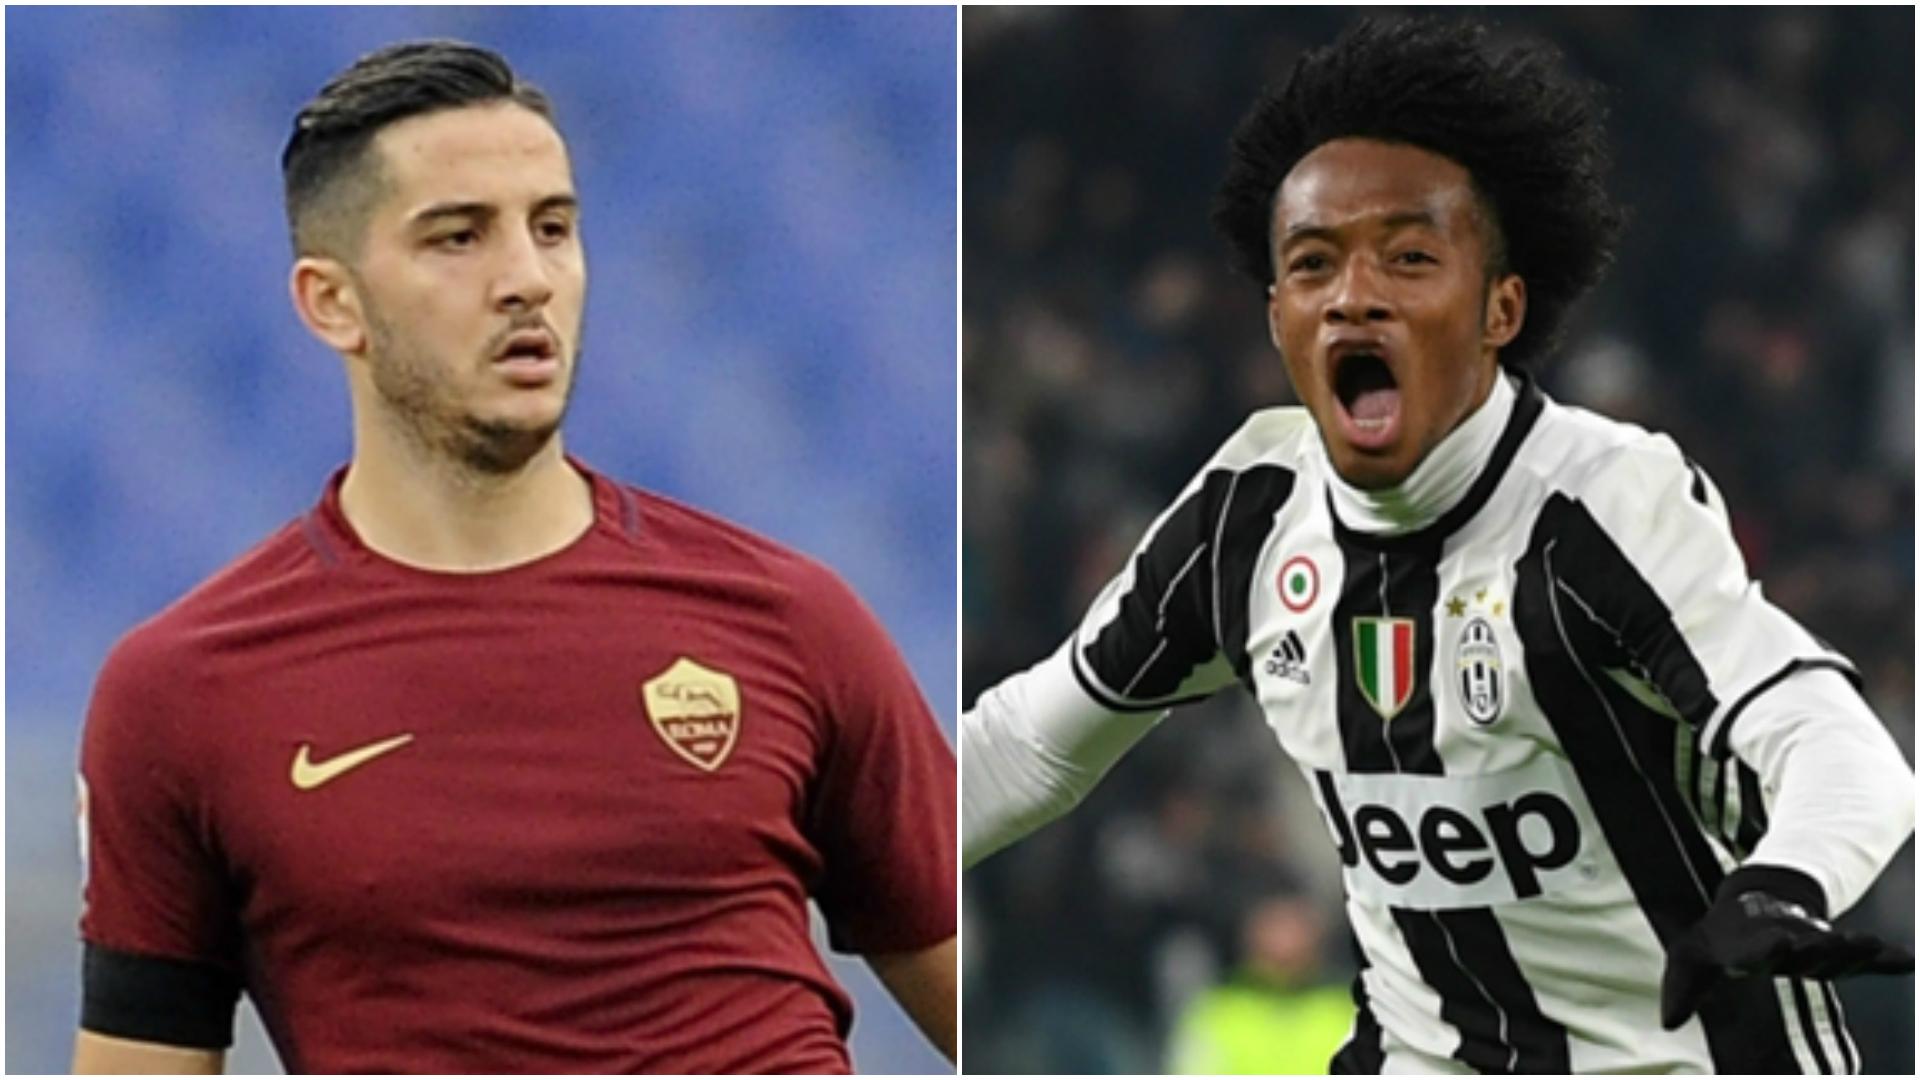 Juventus, Cuadrado in dubbio per la supercoppa